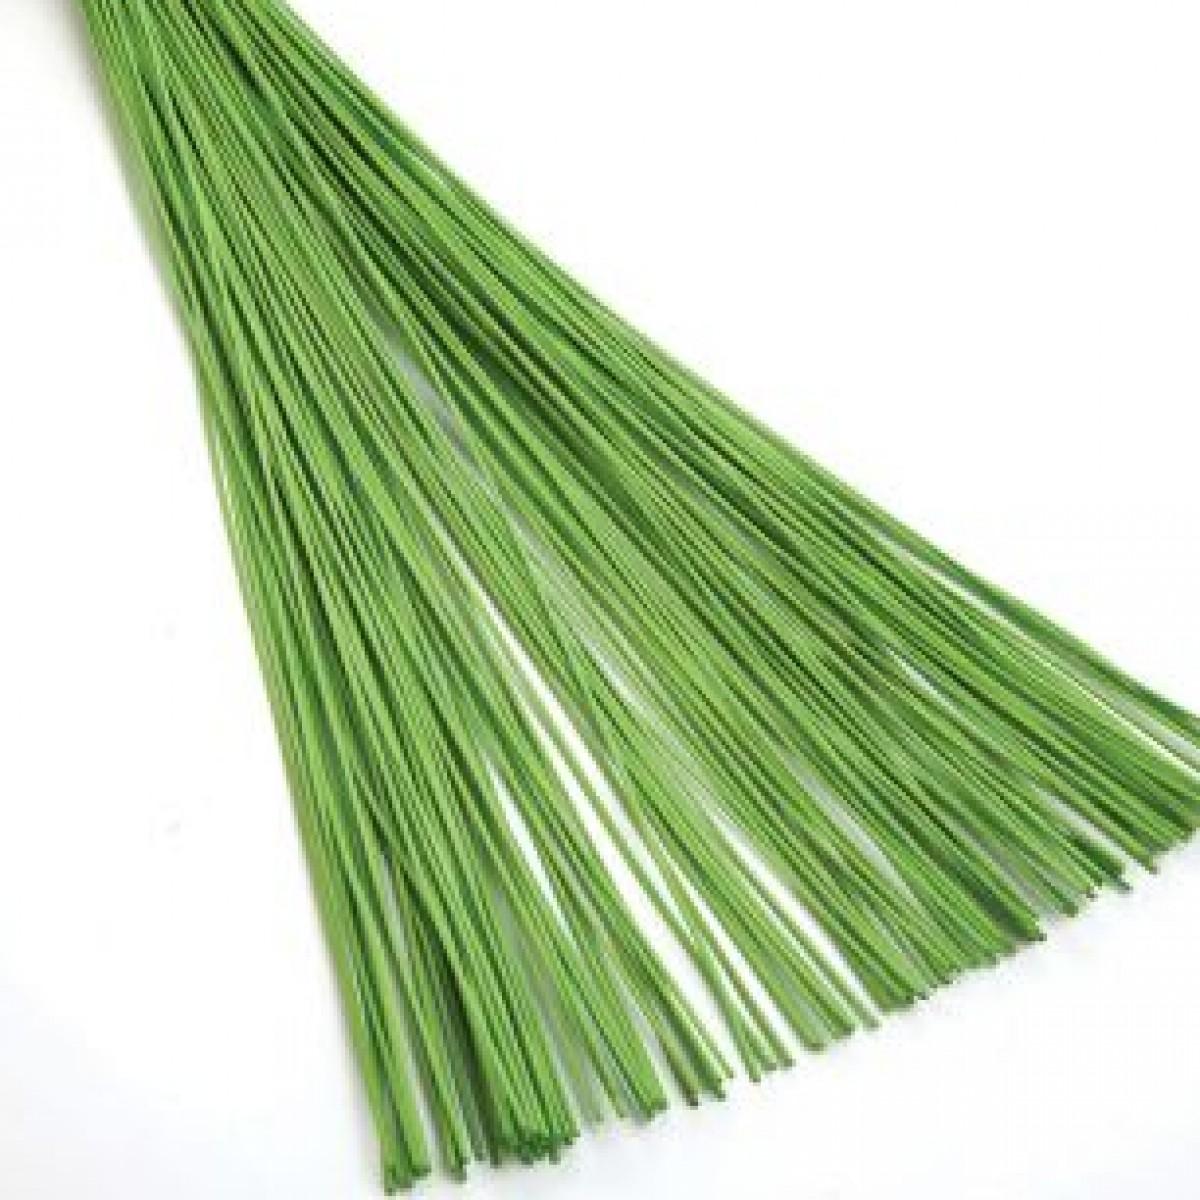 4453 Midelino Stick Apple Green (120-150 Sticks)